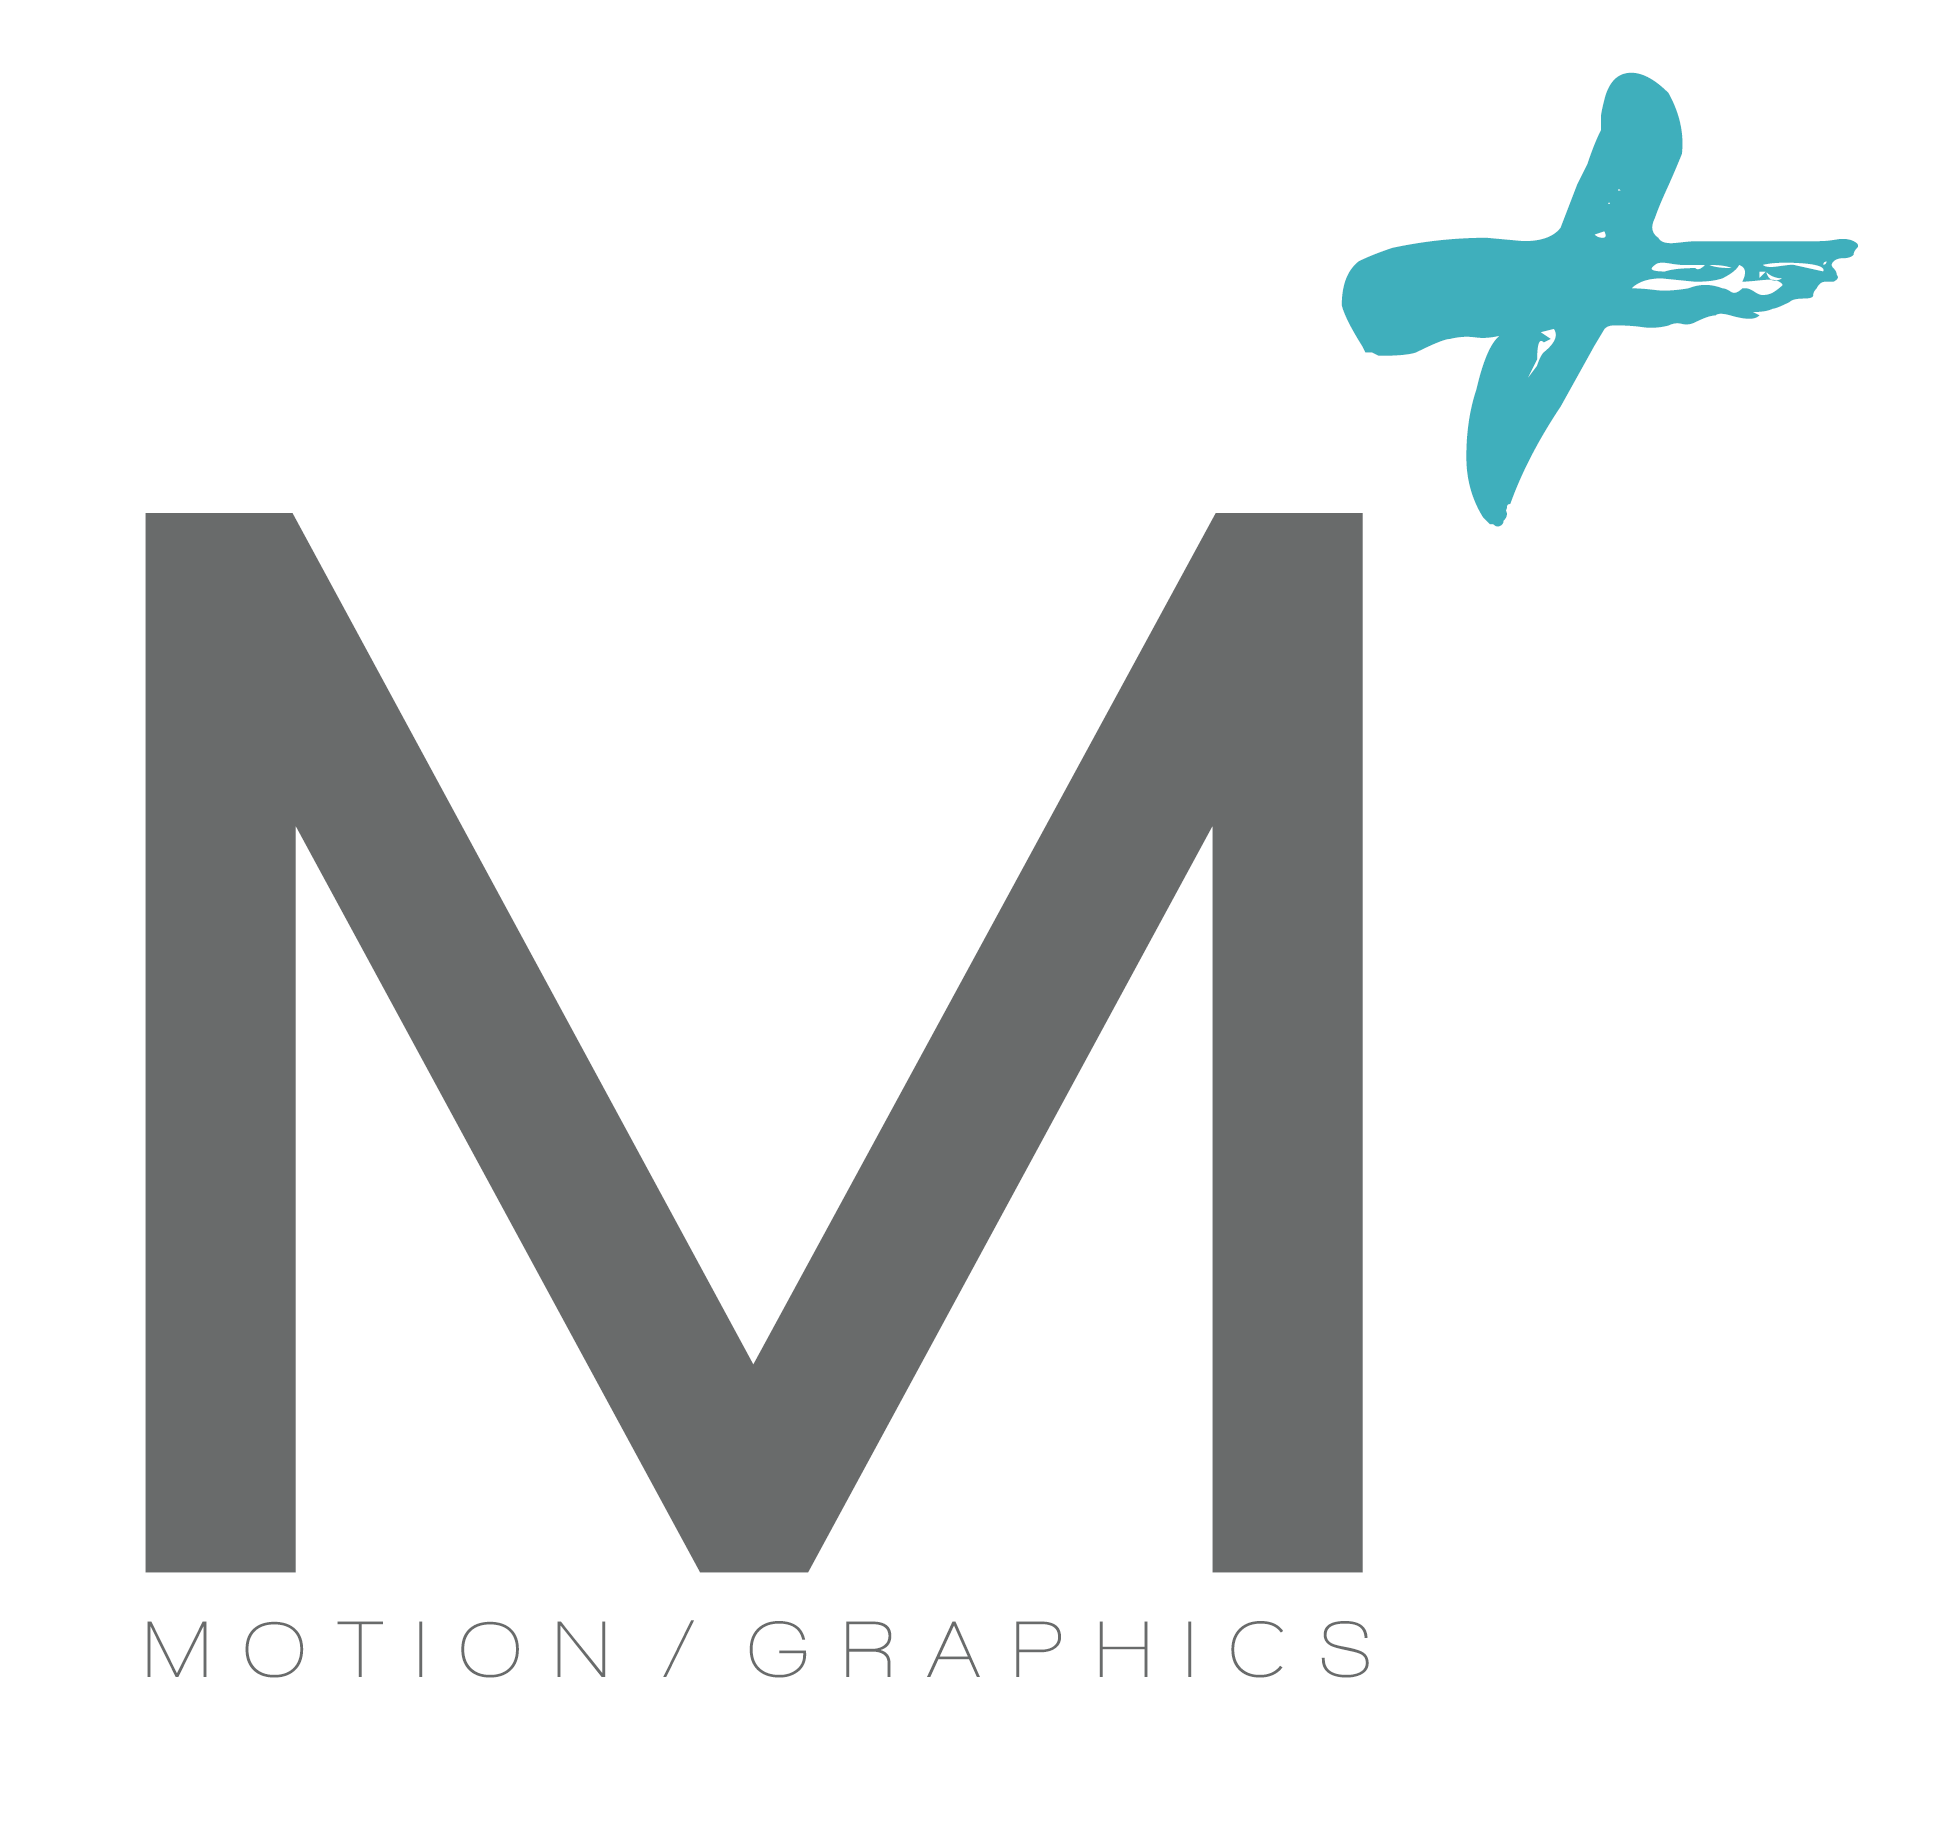 Maxlomax Motion Graphics